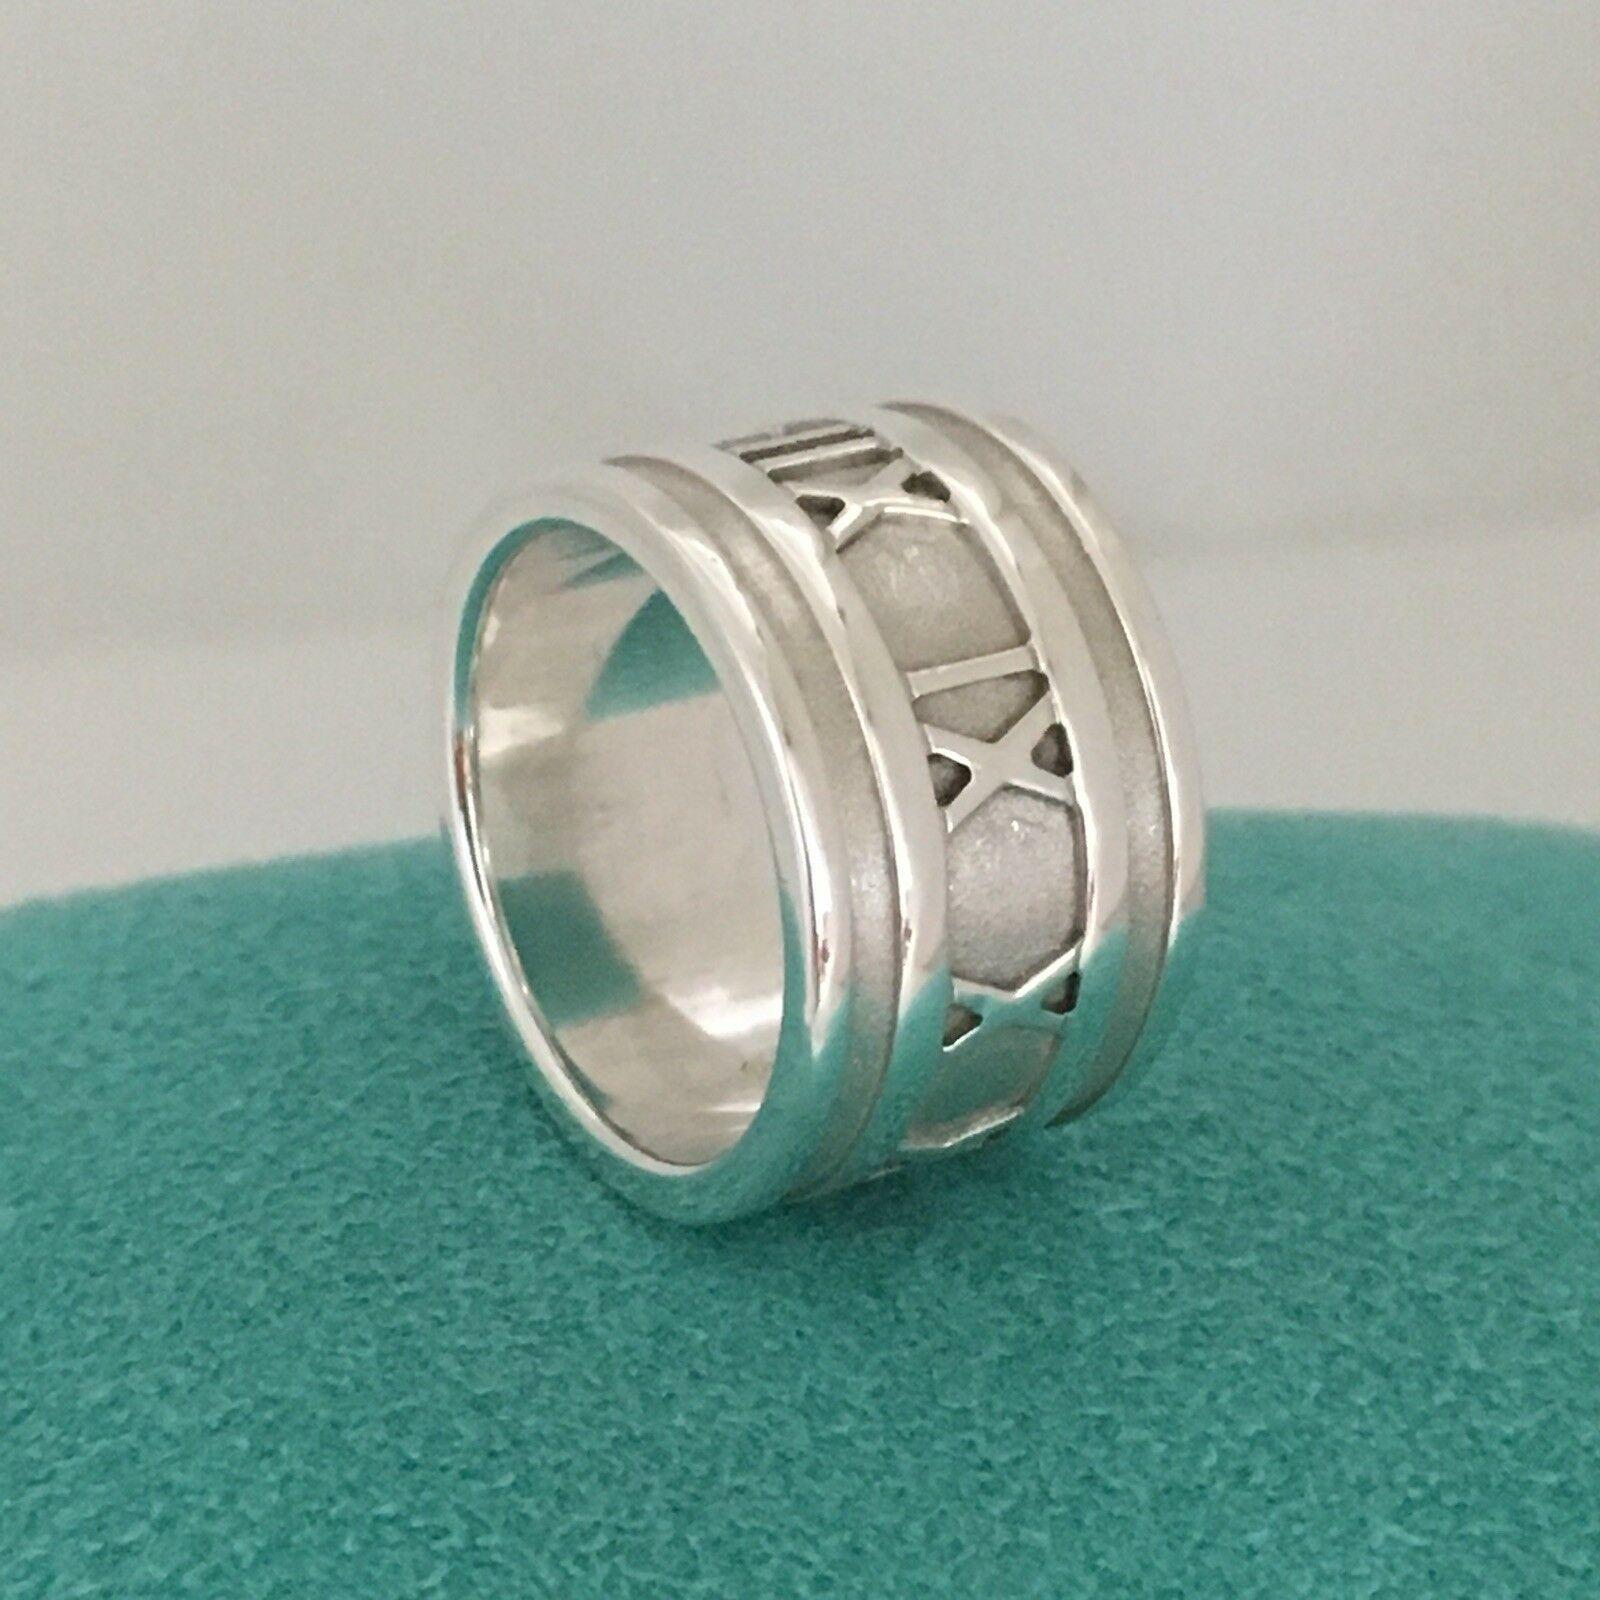 aba34f350 Size 5 Tiffany & Co Men's Unisex Atlas Ring and similar items. 57